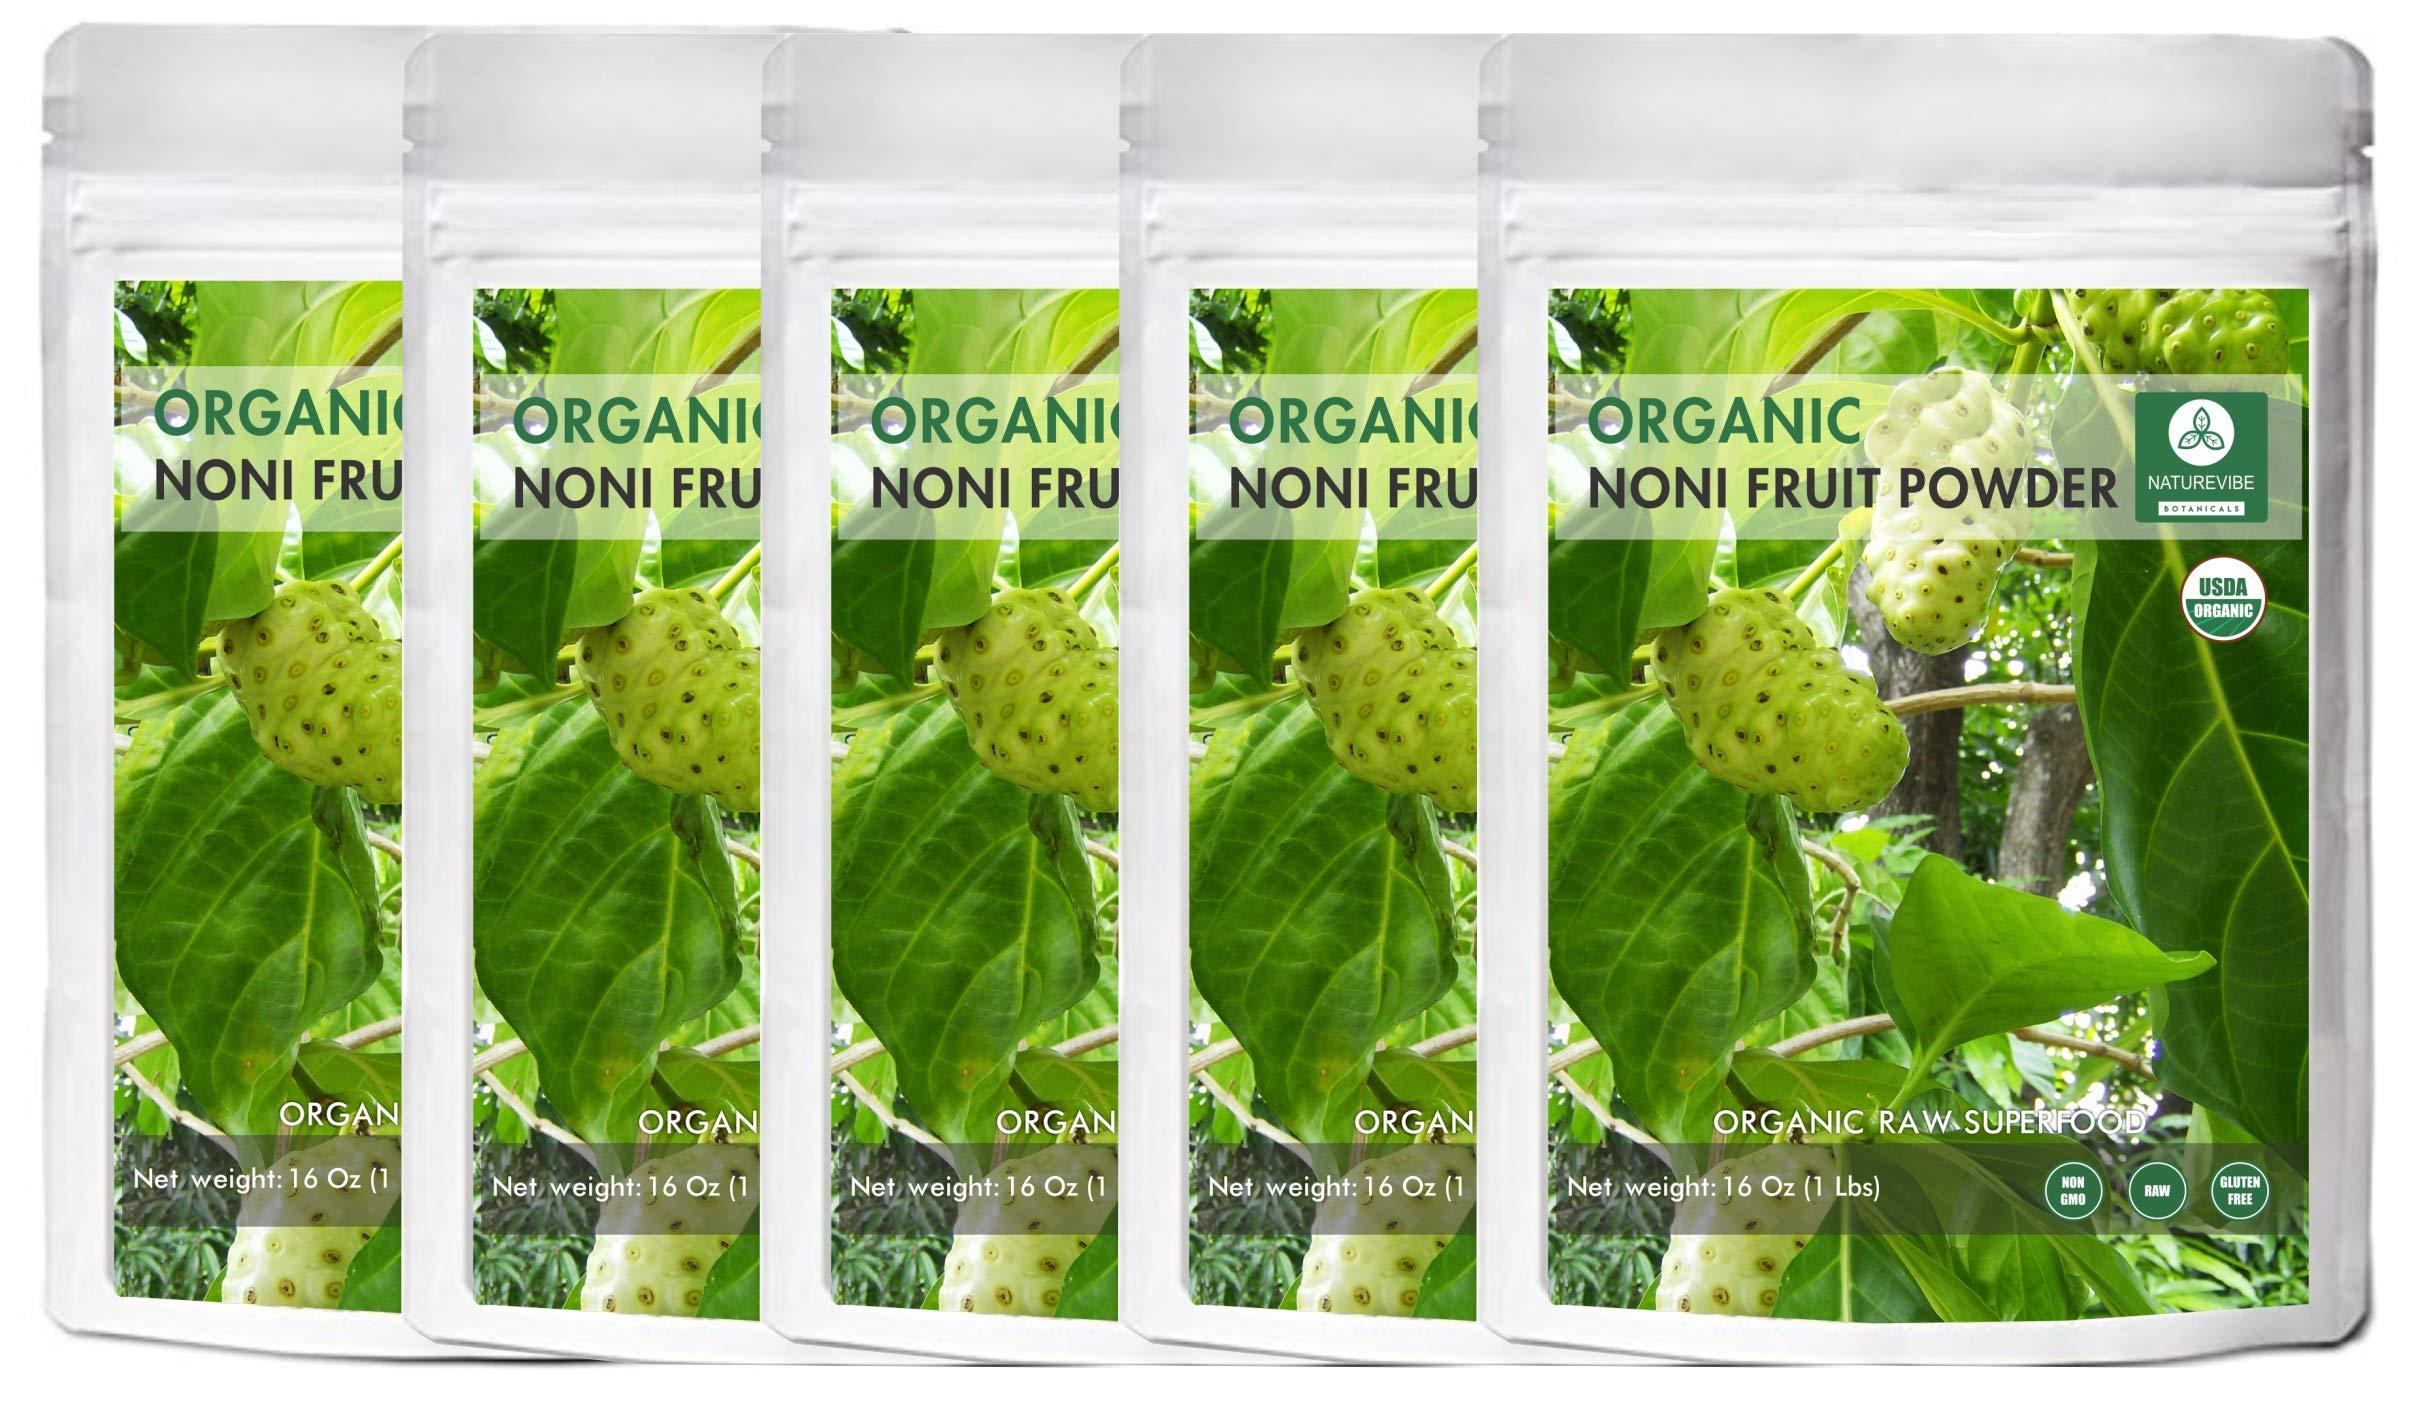 Naturevibe Botanicals USDA Organic Noni Fruit Powder, 5lbs (5 Packs of 16oz Each) - Morinda Citrifolia - 100% Pure & Natural - Gluten Free & Non-GMO by Naturevibe Botanicals